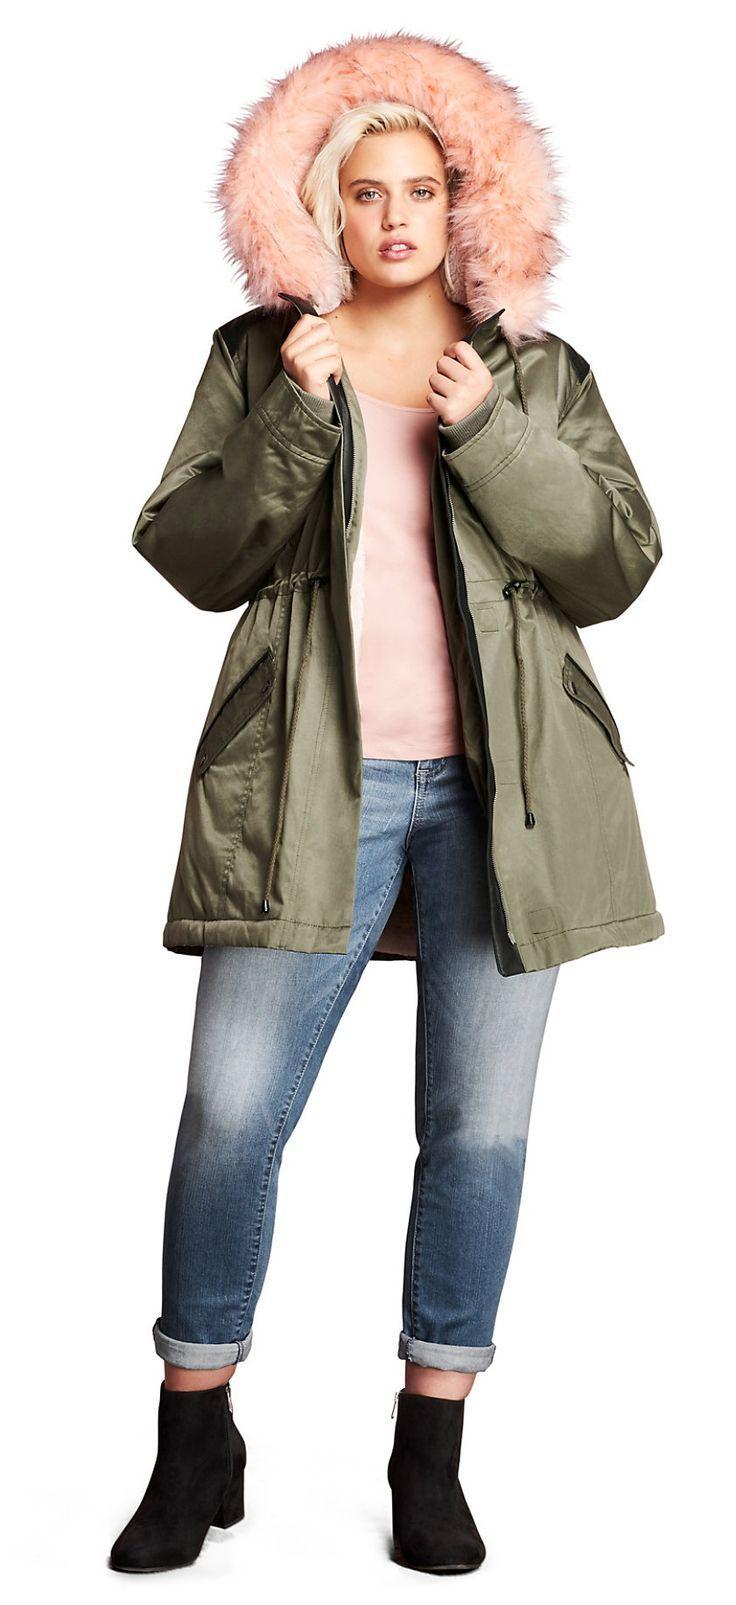 plus size anorak jacket - plus size fall outfit - plus size